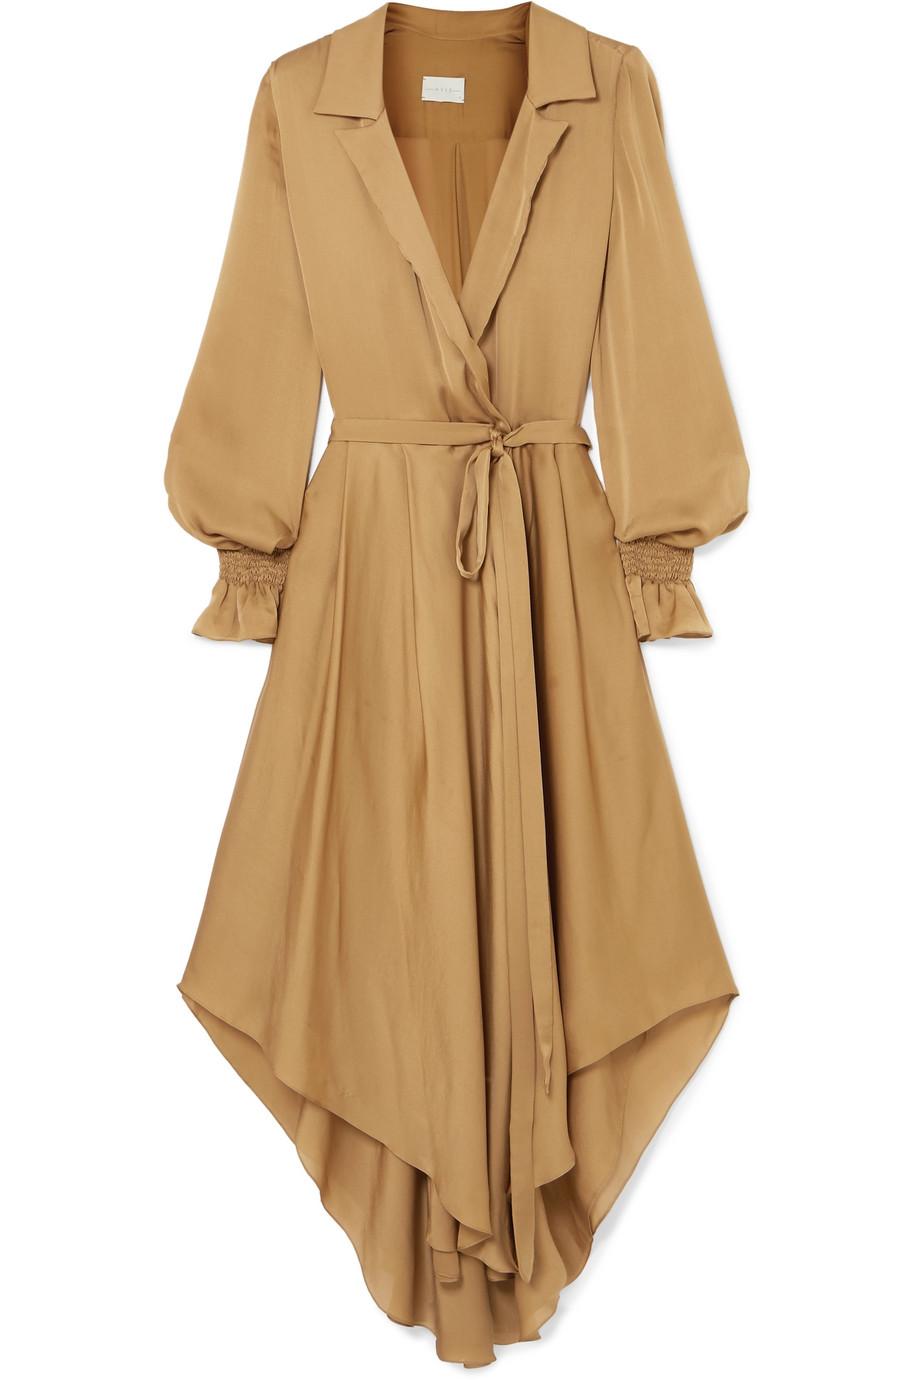 ARJÉ Dress $1045